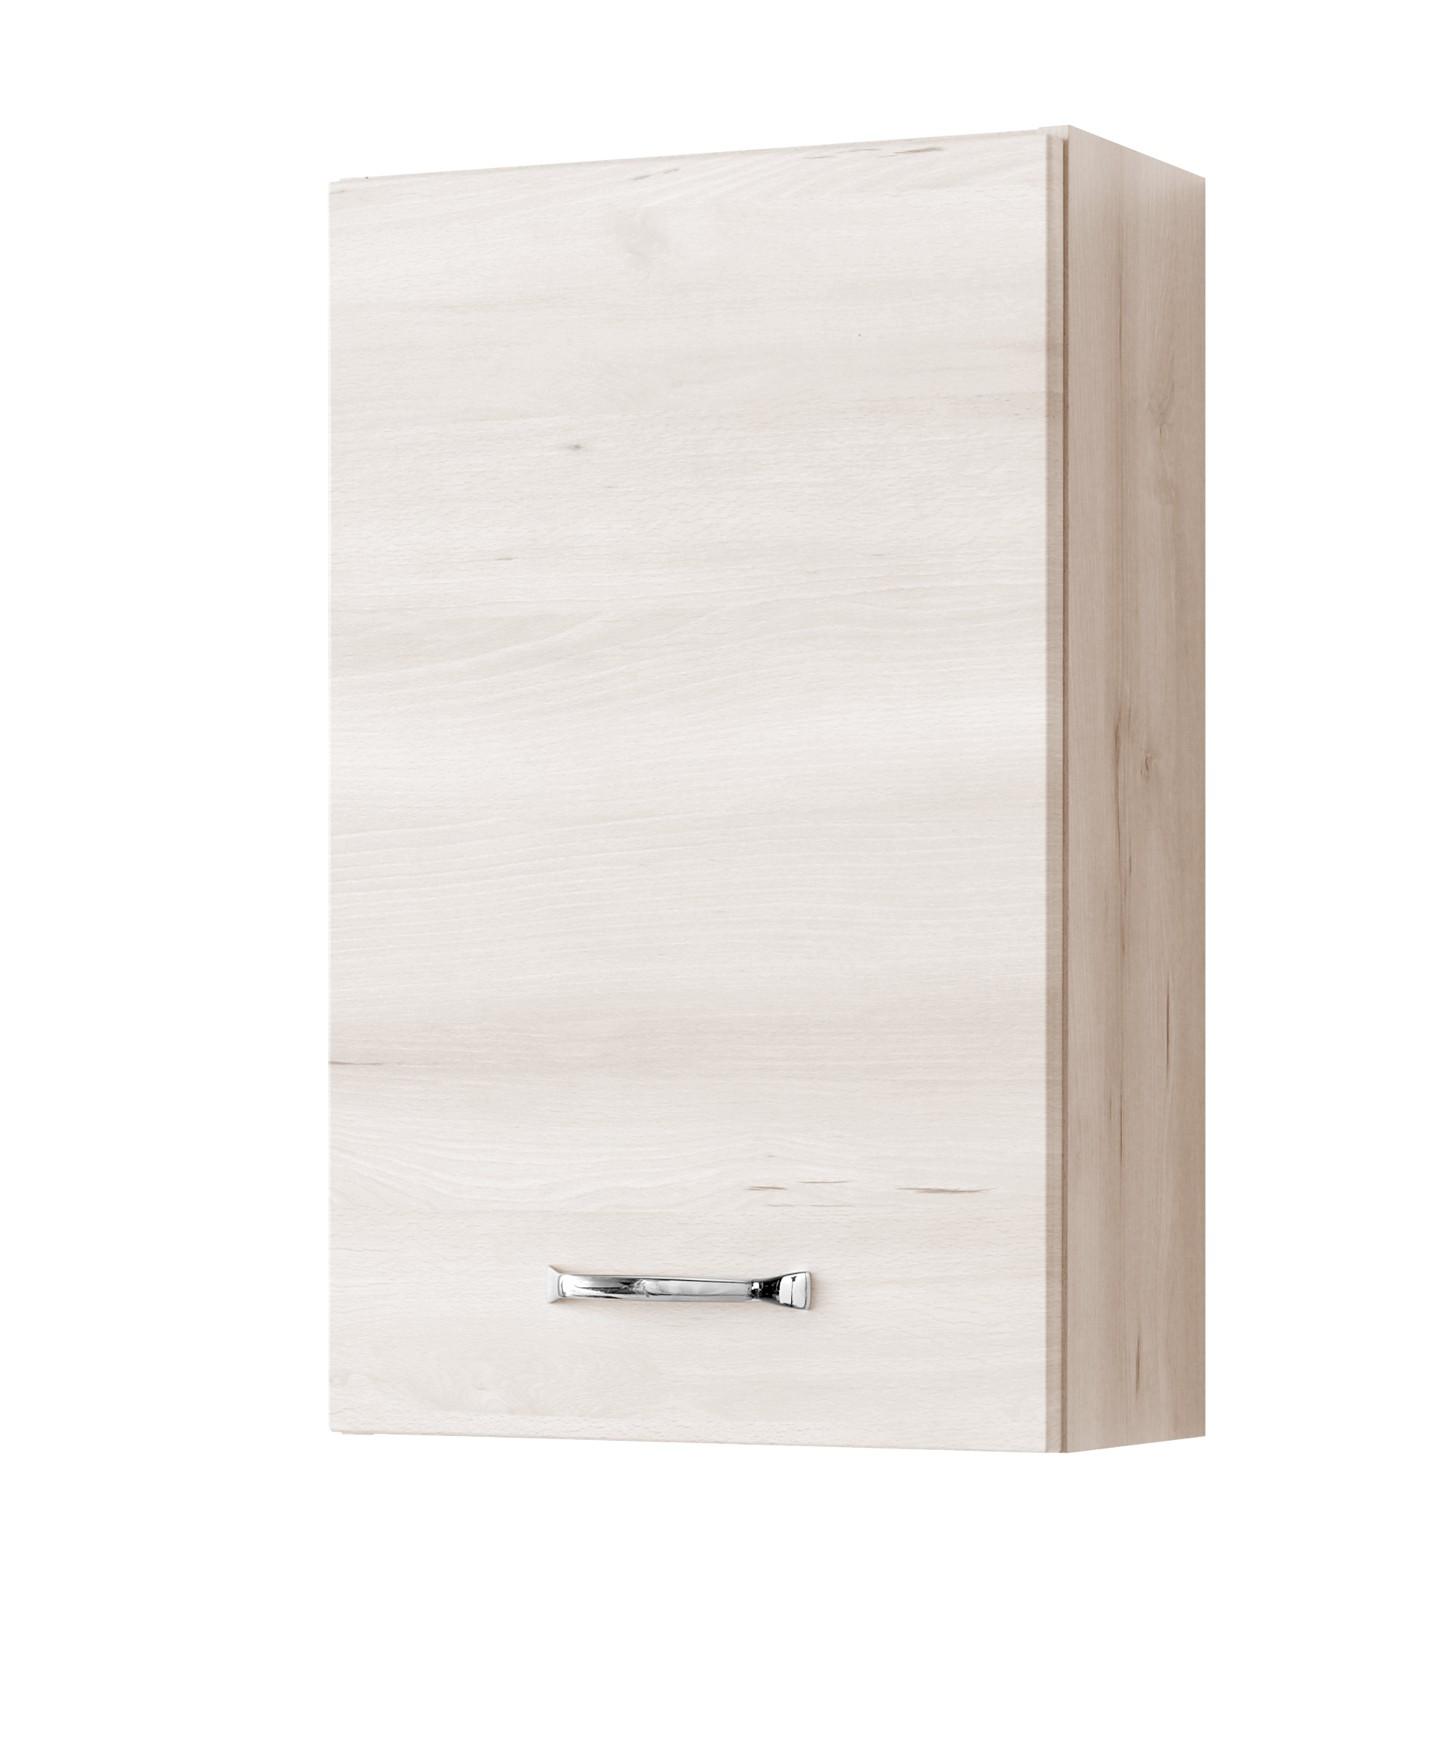 bad h ngeschrank fontana 1 t rig 40 cm breit buche iconic mit echtholzstruktur bad fontana. Black Bedroom Furniture Sets. Home Design Ideas